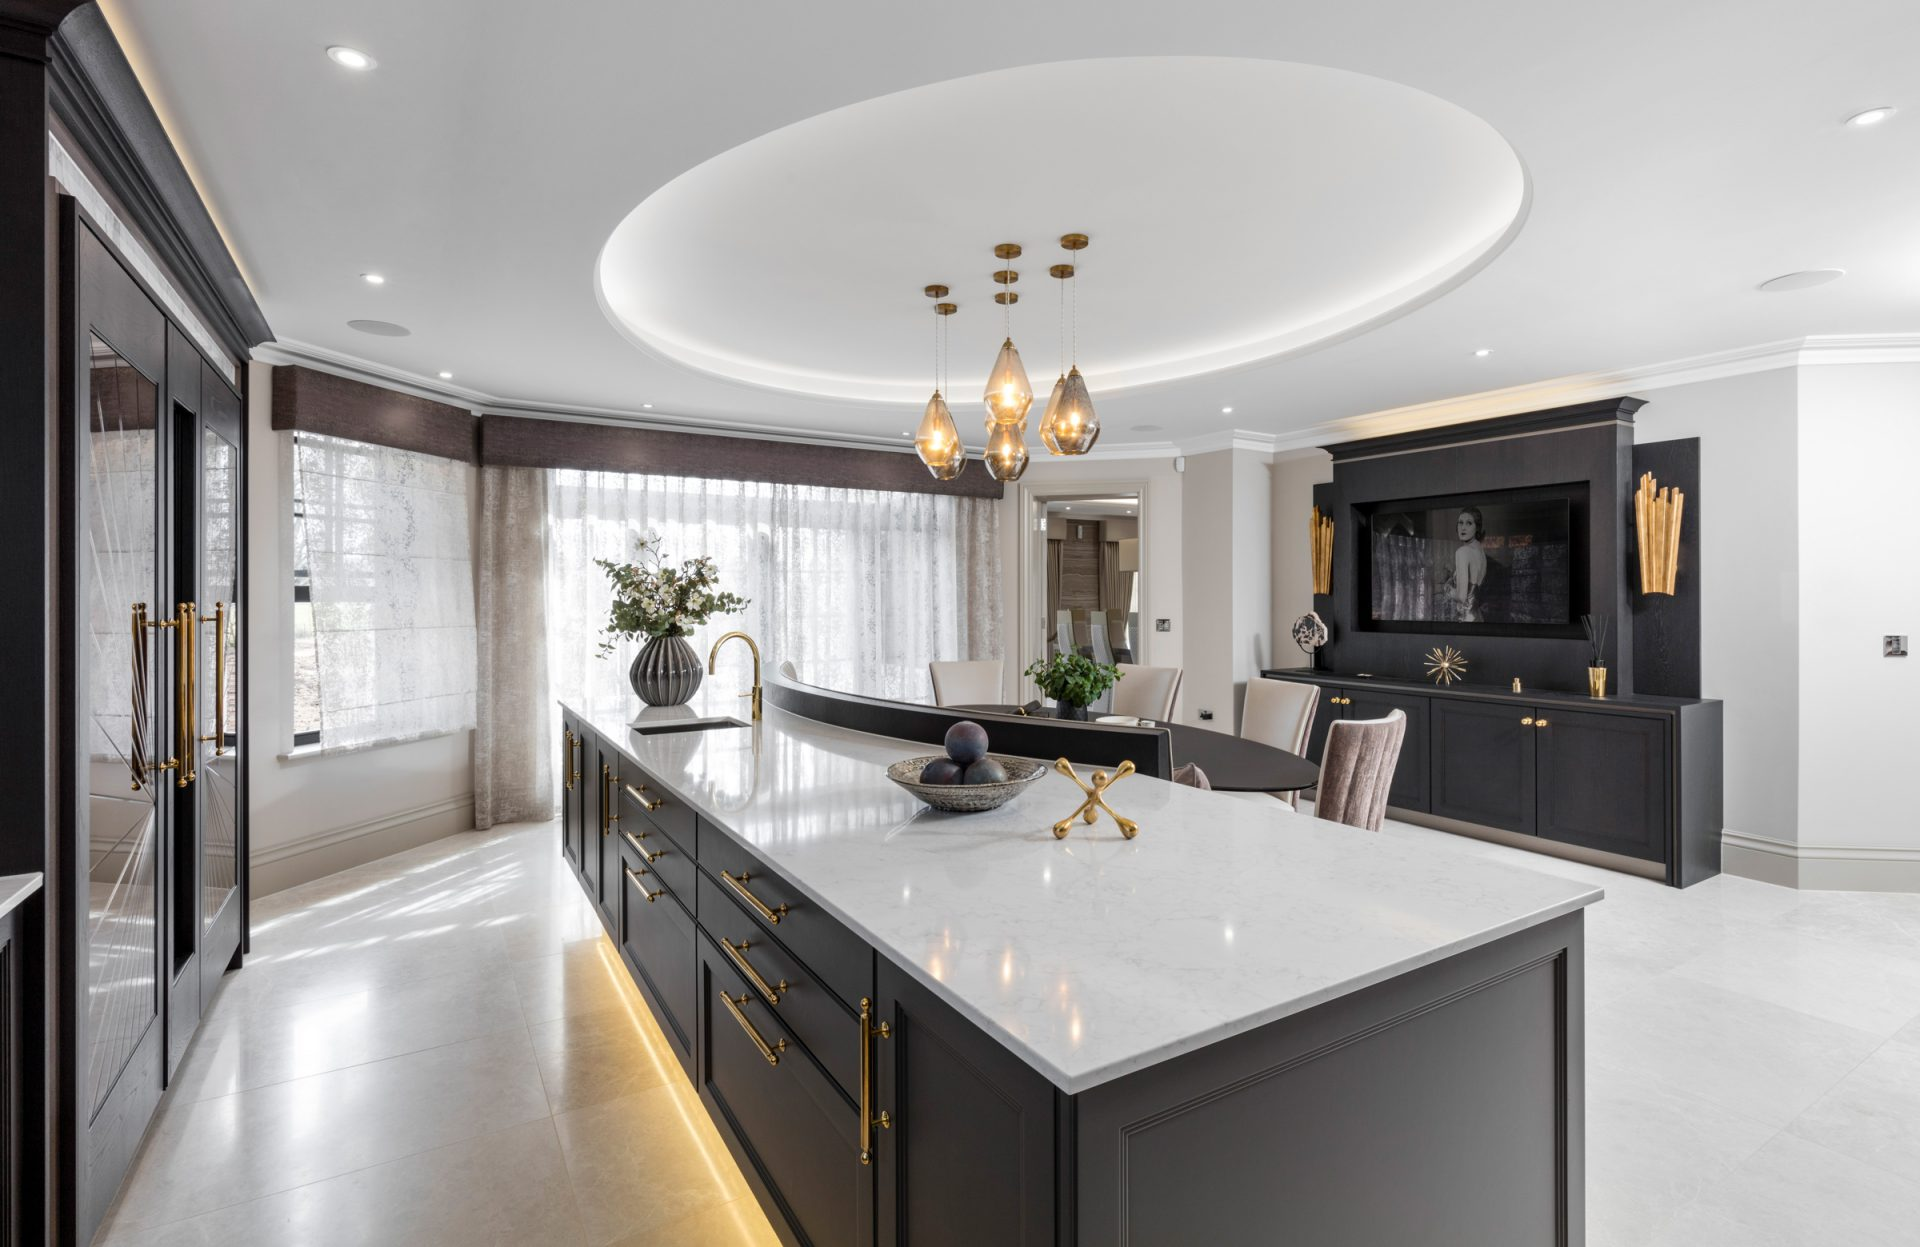 Extreme Art Deco Luxury Kitchen with TV